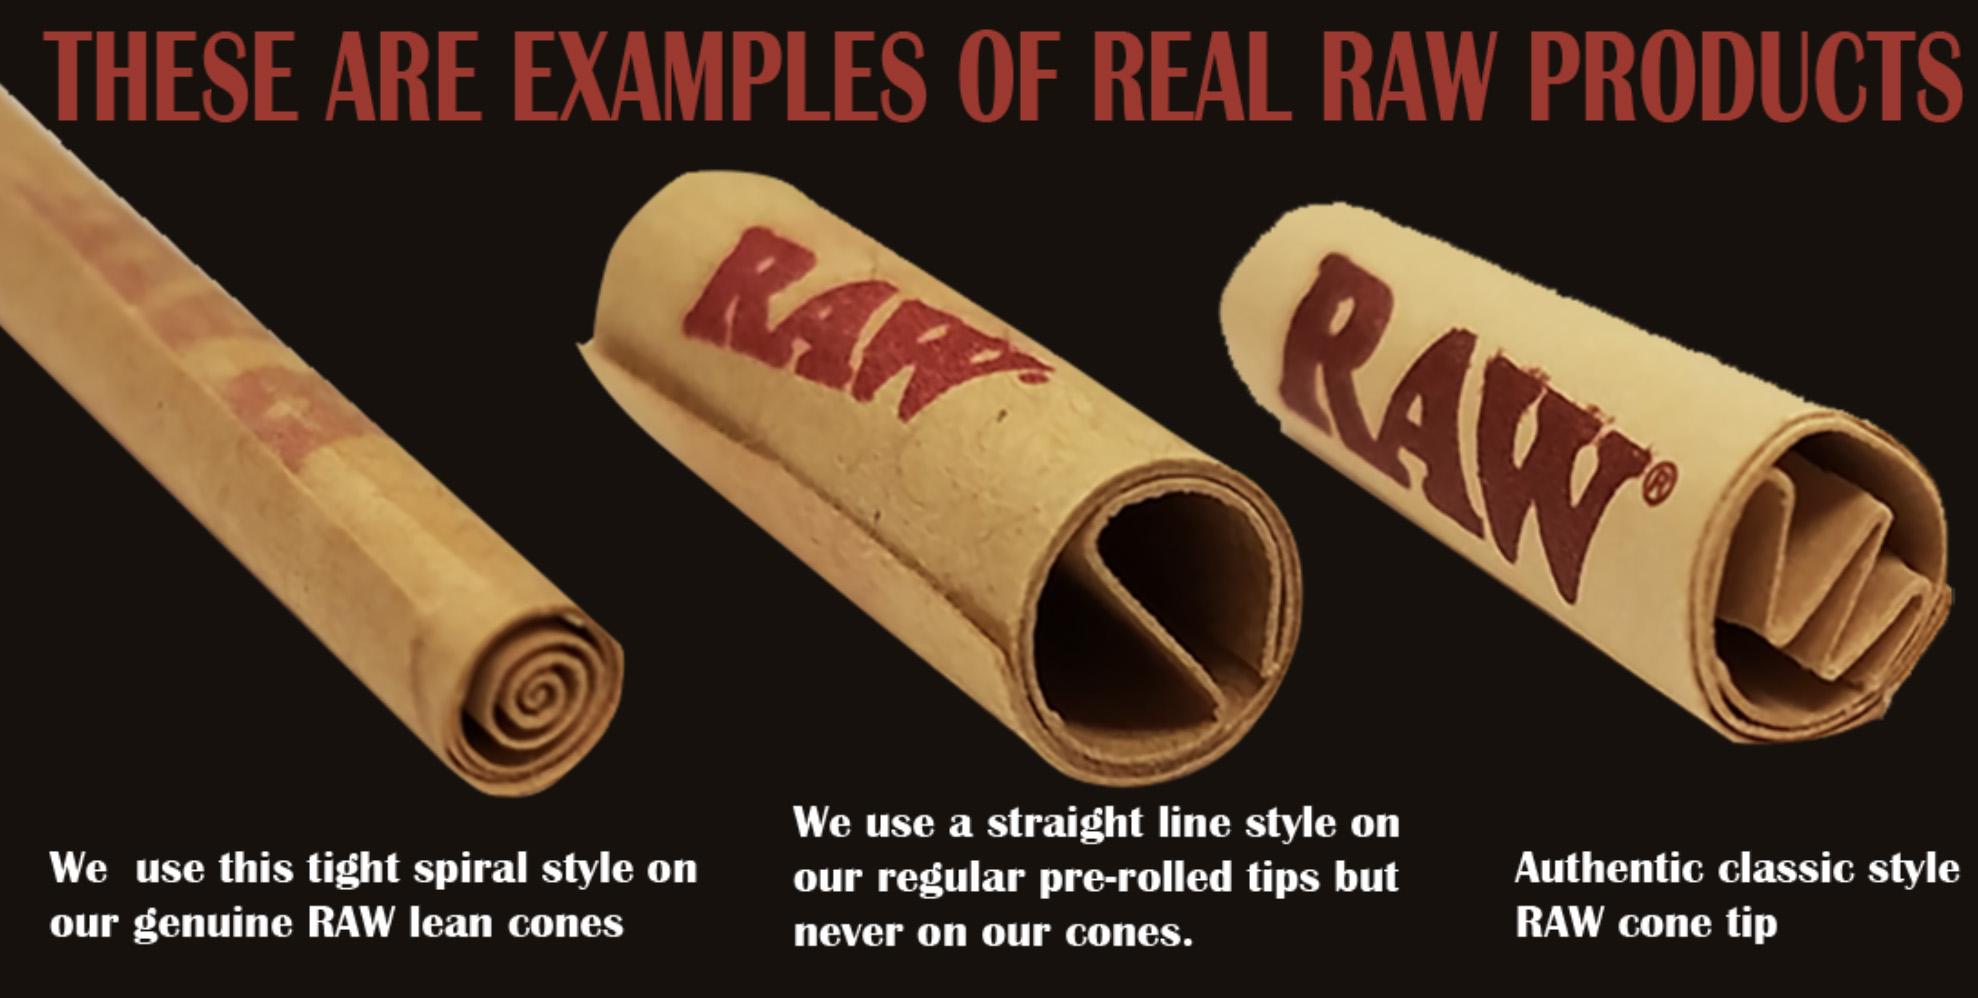 raw-tips-fakes.jpg